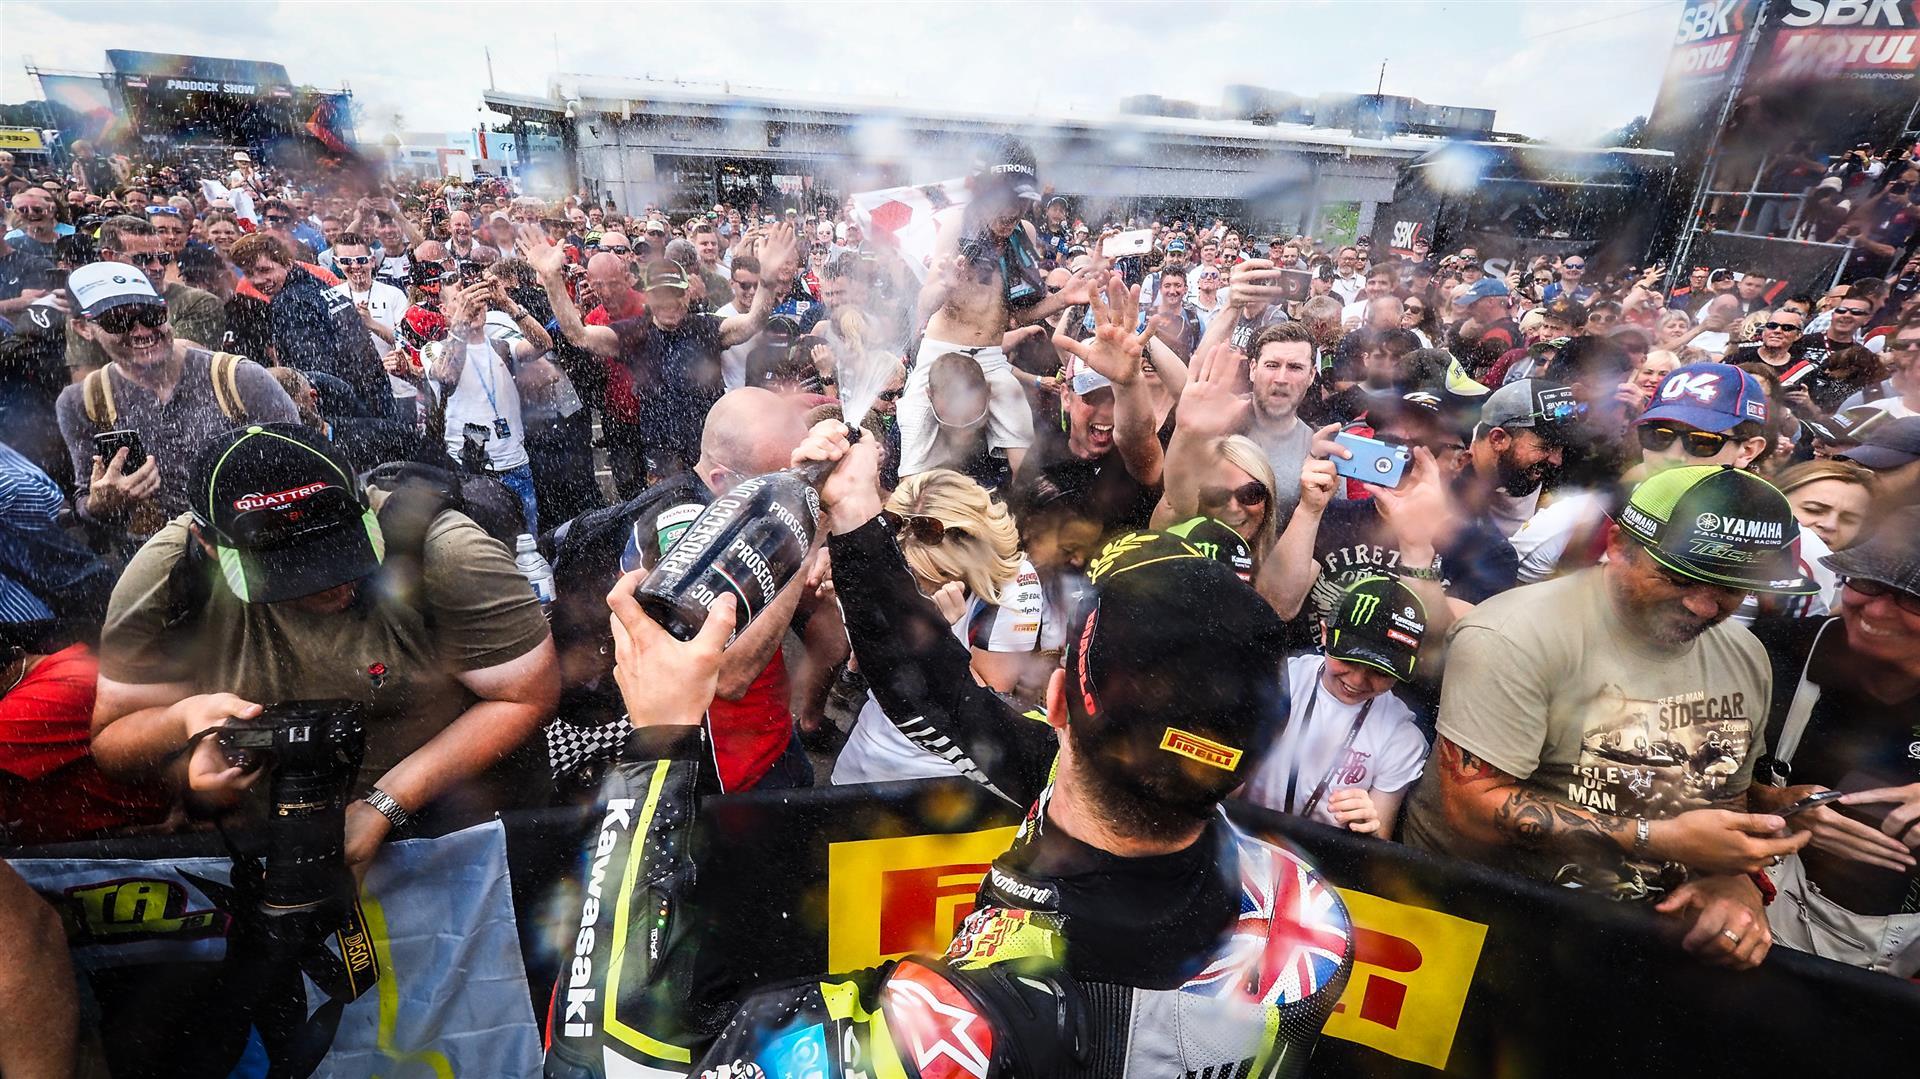 FIM スーパーバイク世界選手権(SBK)オーシャースレーベン戦が中止